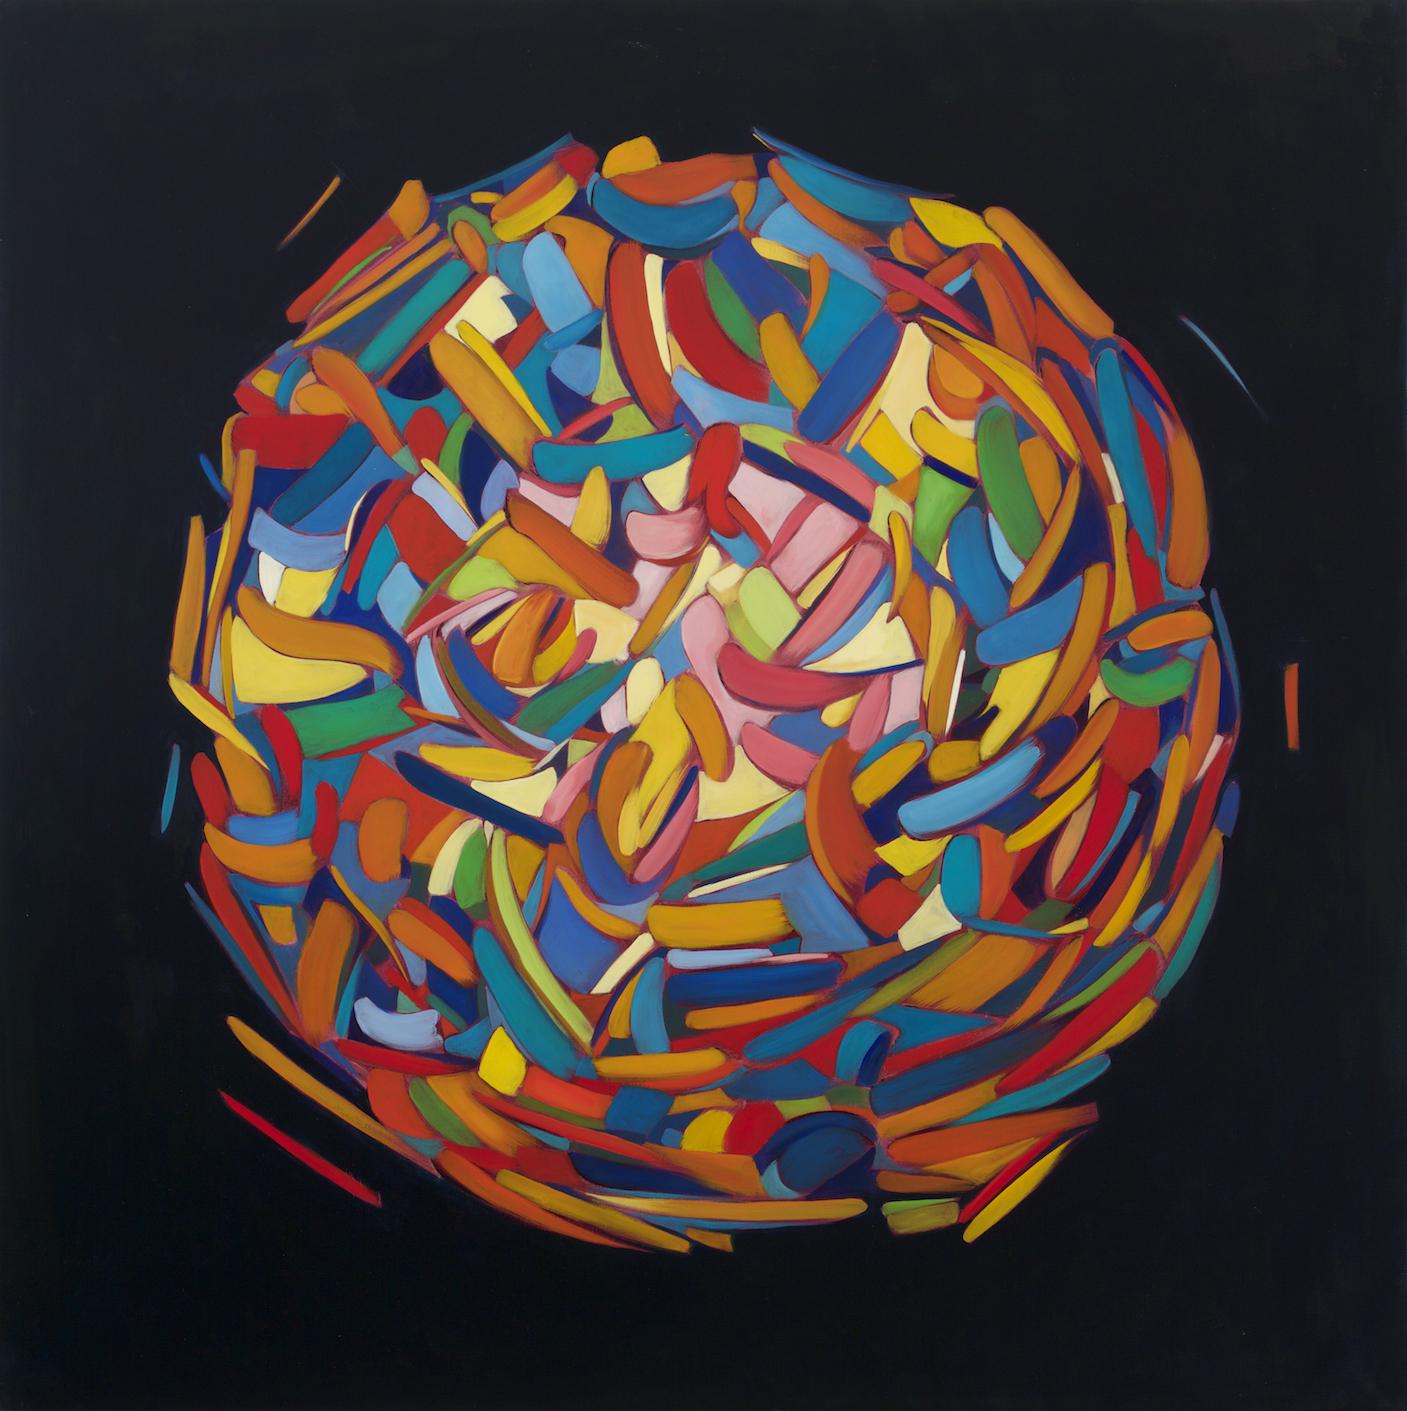 Planete Peinture, 2018